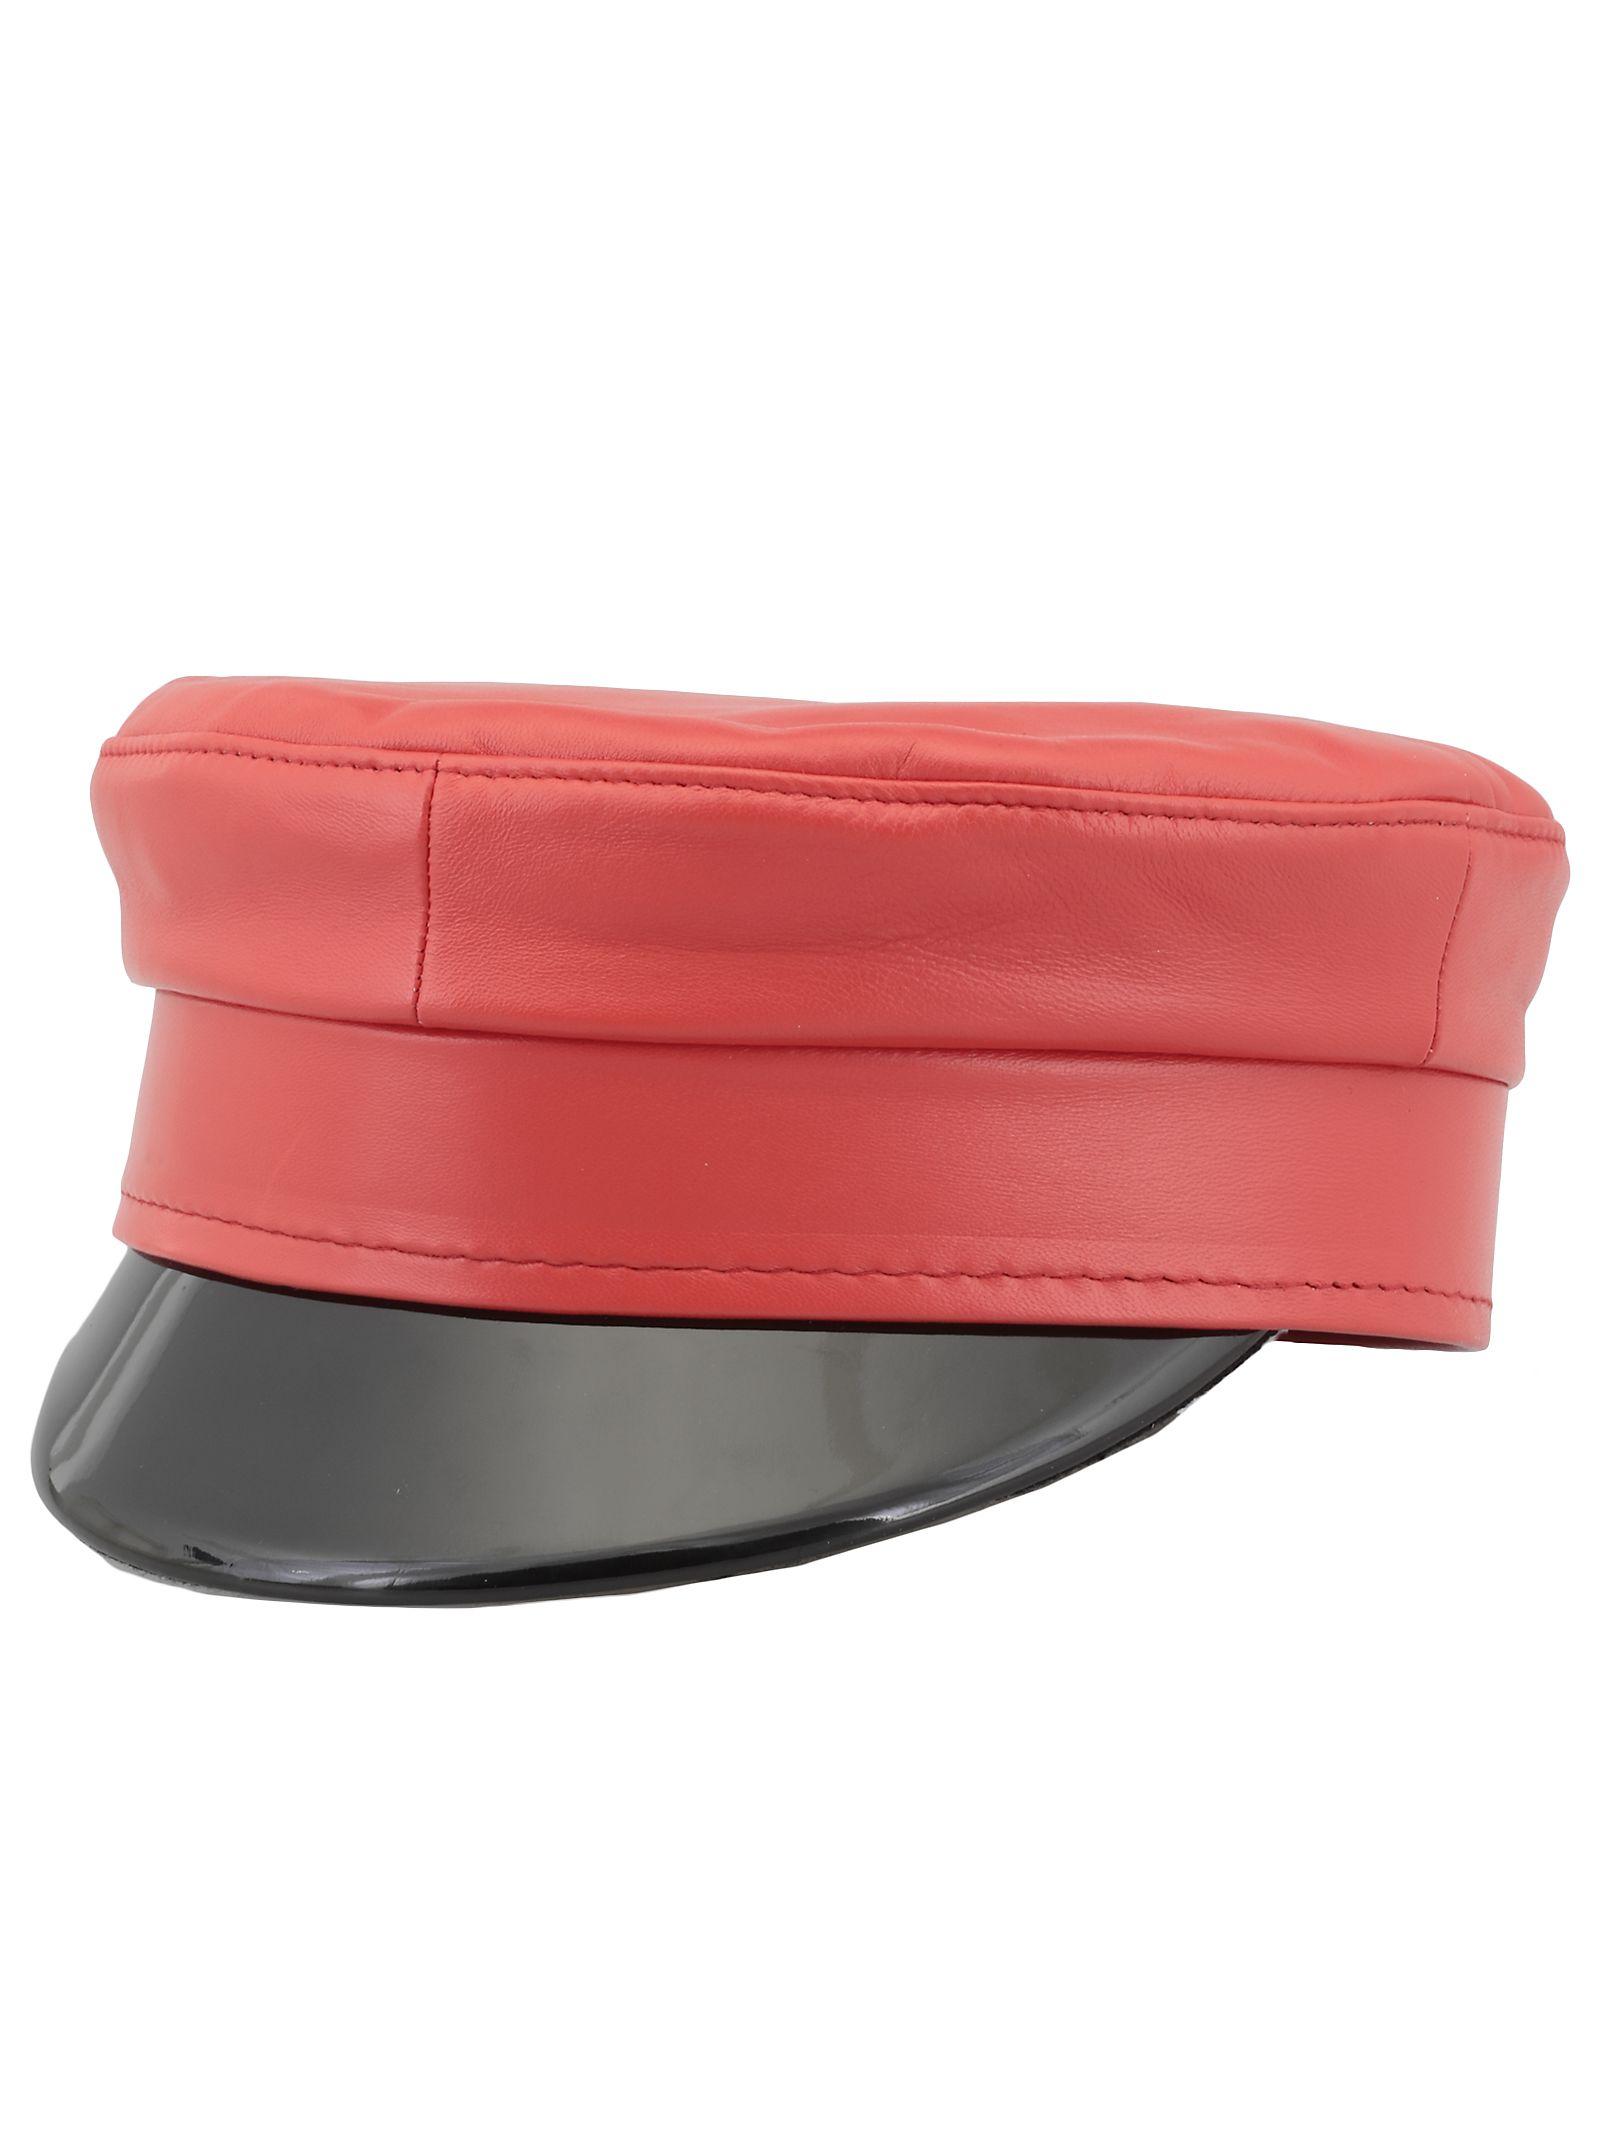 Ruslan Baginskiy Ruslan Baginskiy Baker Boy Red Cap - RED - 10786316 ... f2cc29c90ec9